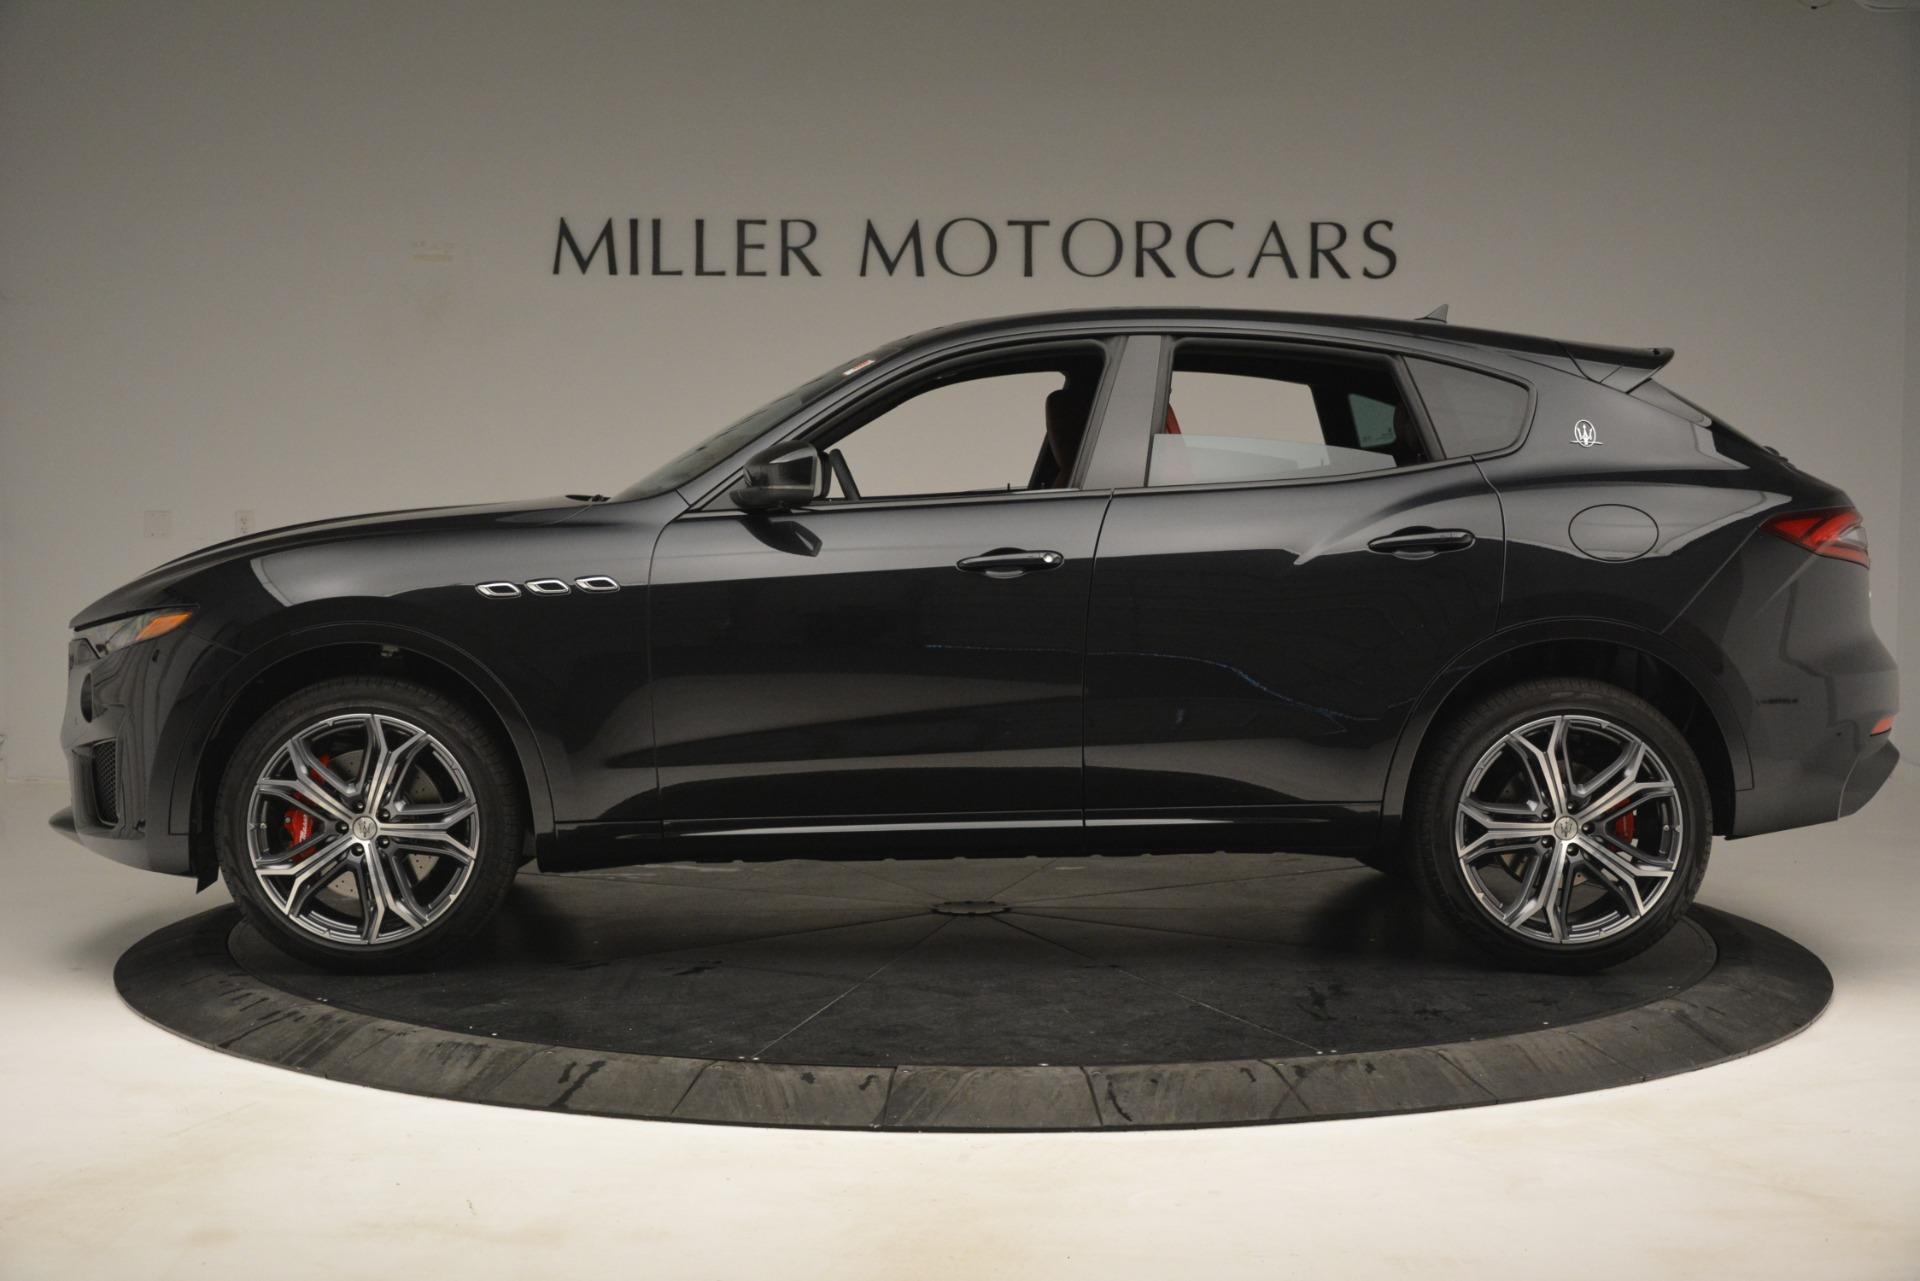 New 2019 Maserati Levante GTS For Sale In Westport, CT 3023_p3